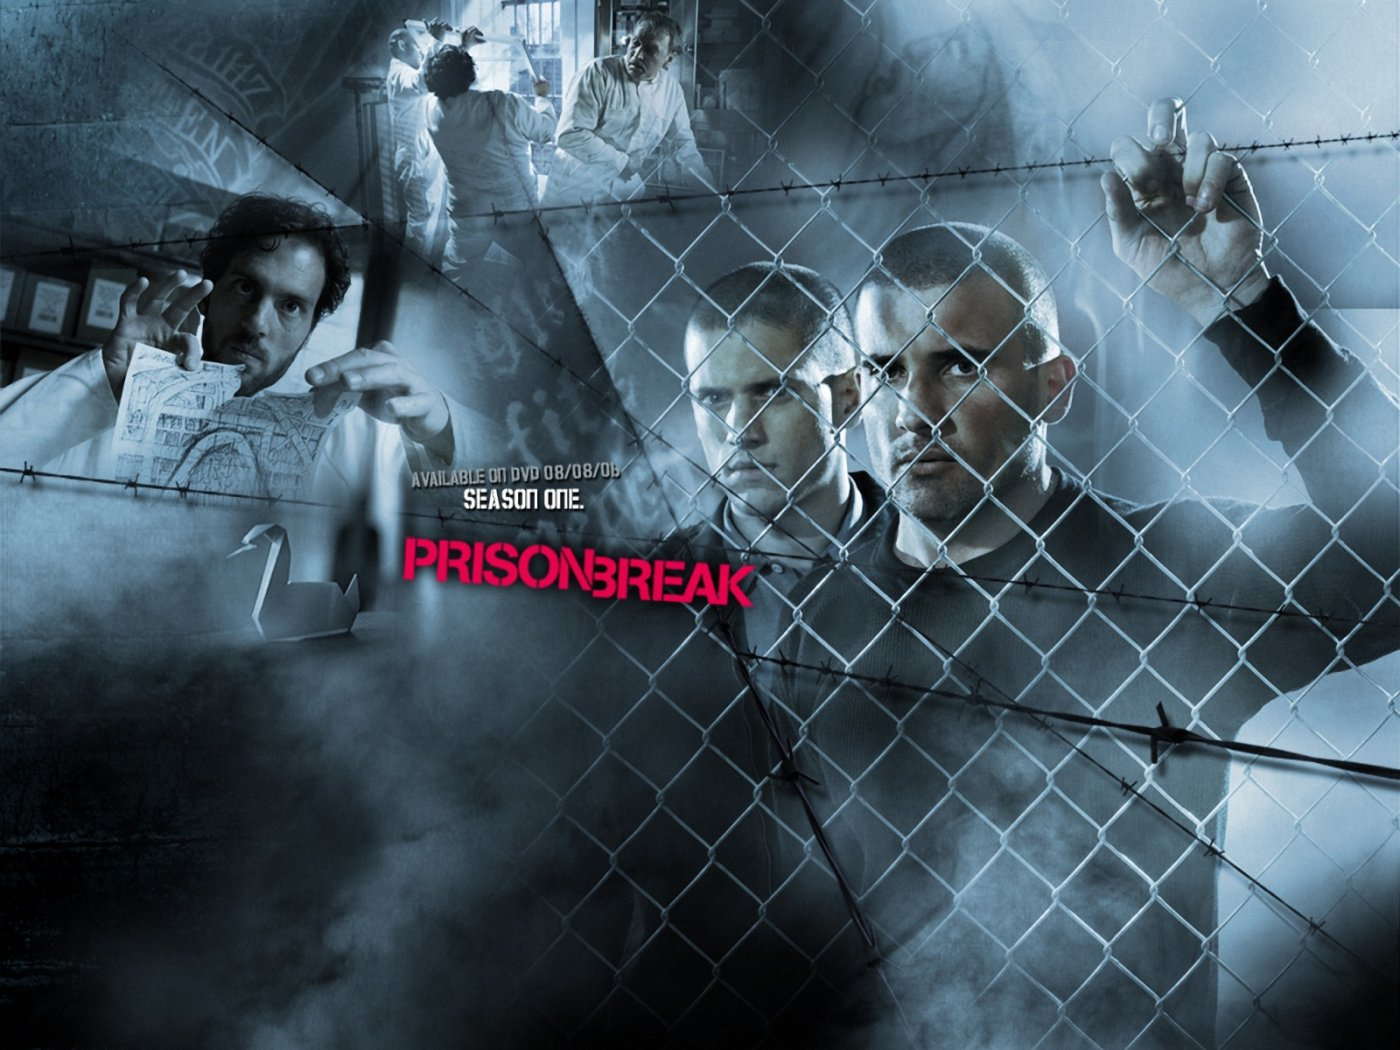 Prison Break Wallpaper 1400x1050 Wallpapers 1400x1050 Wallpapers 1400x1050